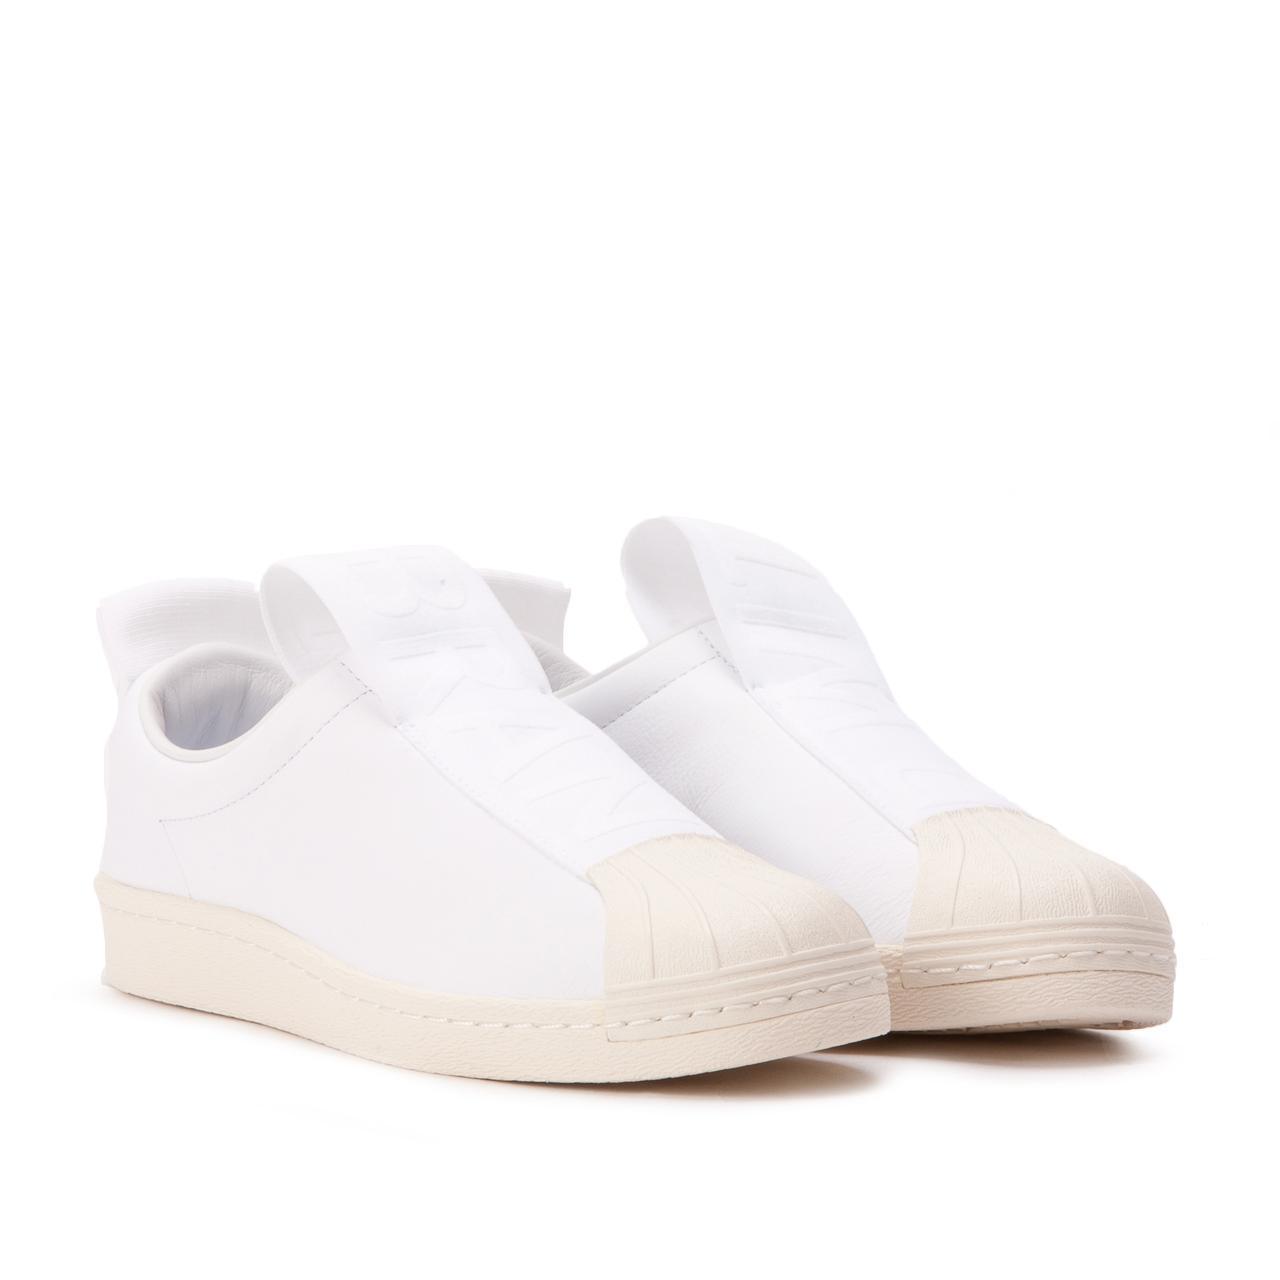 adidas Leather Superstar Bw3s Slip On